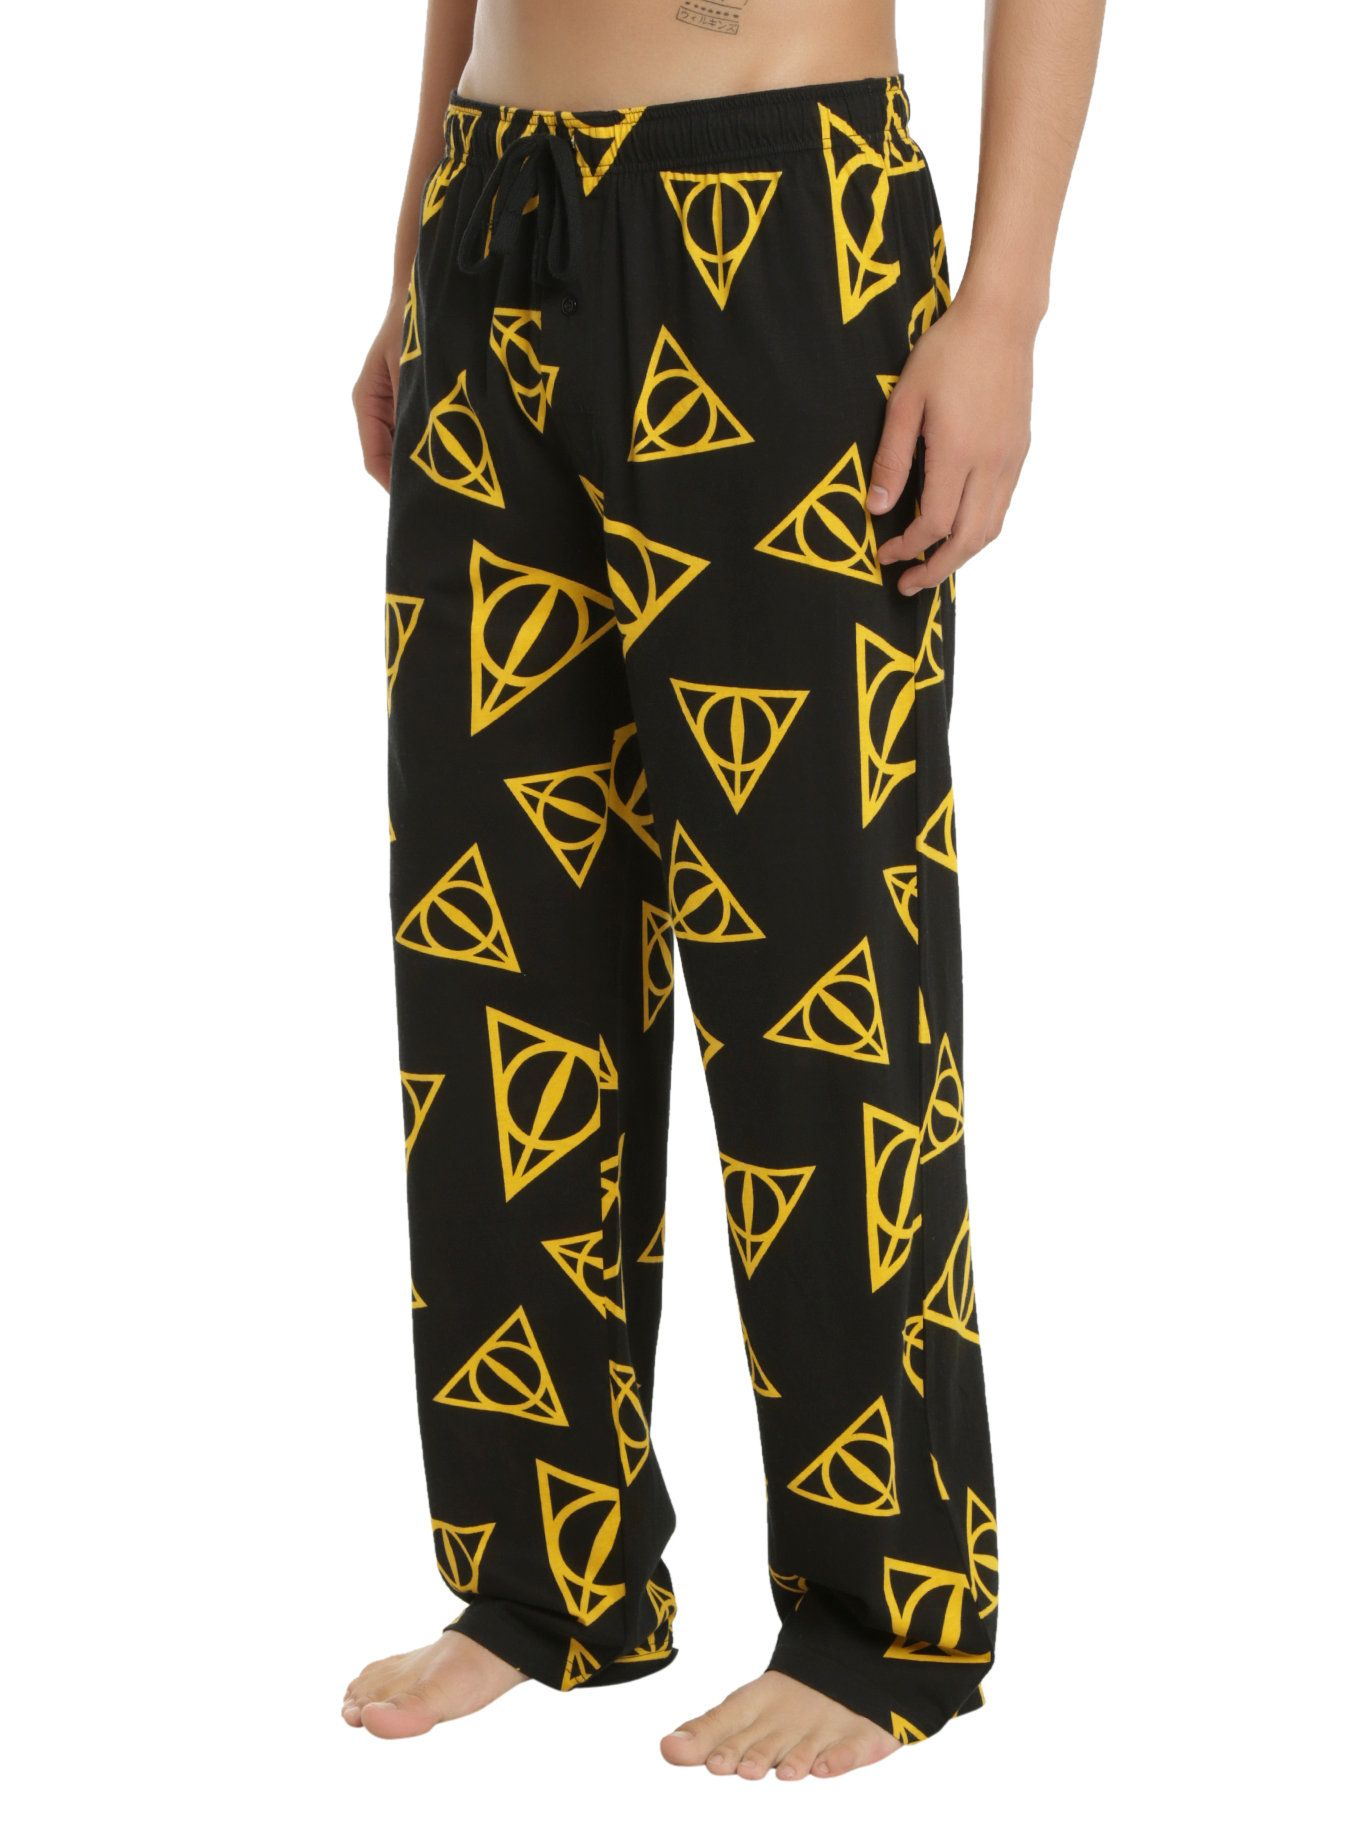 Harry potter deathly hallows print guys pajama pants